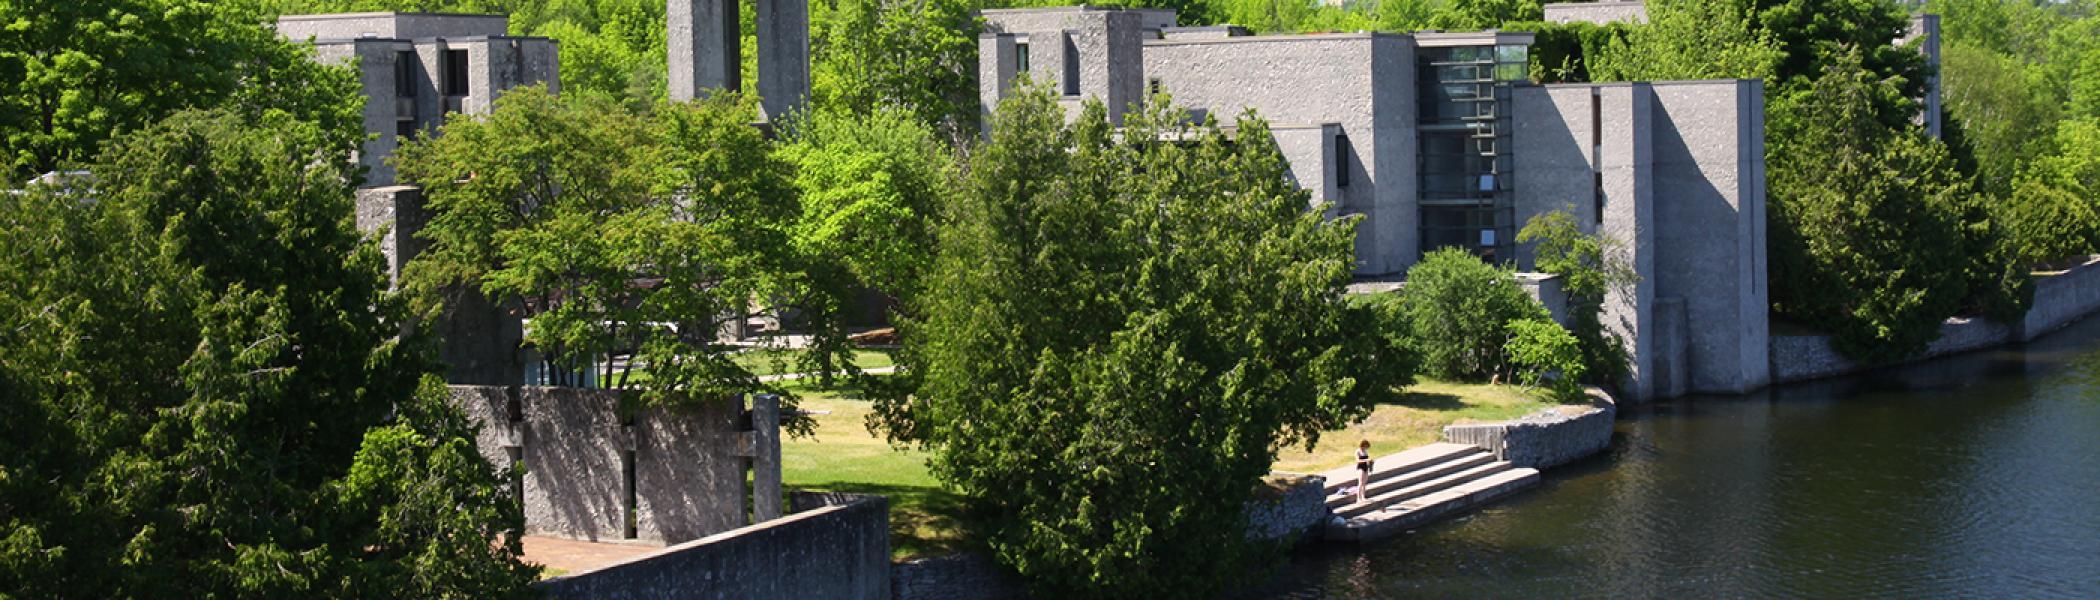 Champlain College vista overlooking the Otonabee river